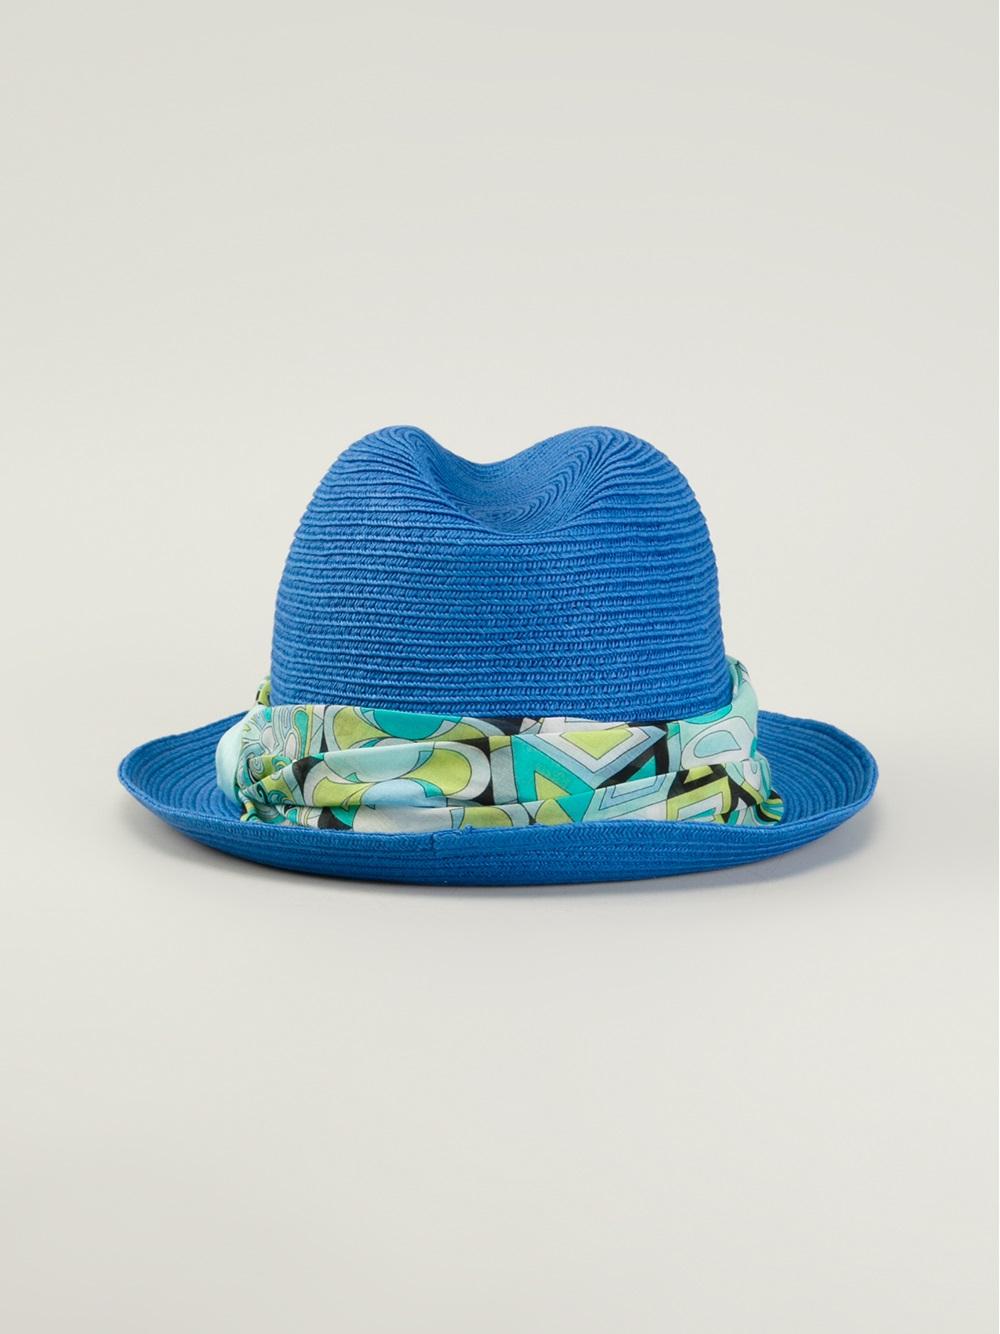 Lyst - Emilio Pucci Panama Hat in Blue 7e55f2e5a66e